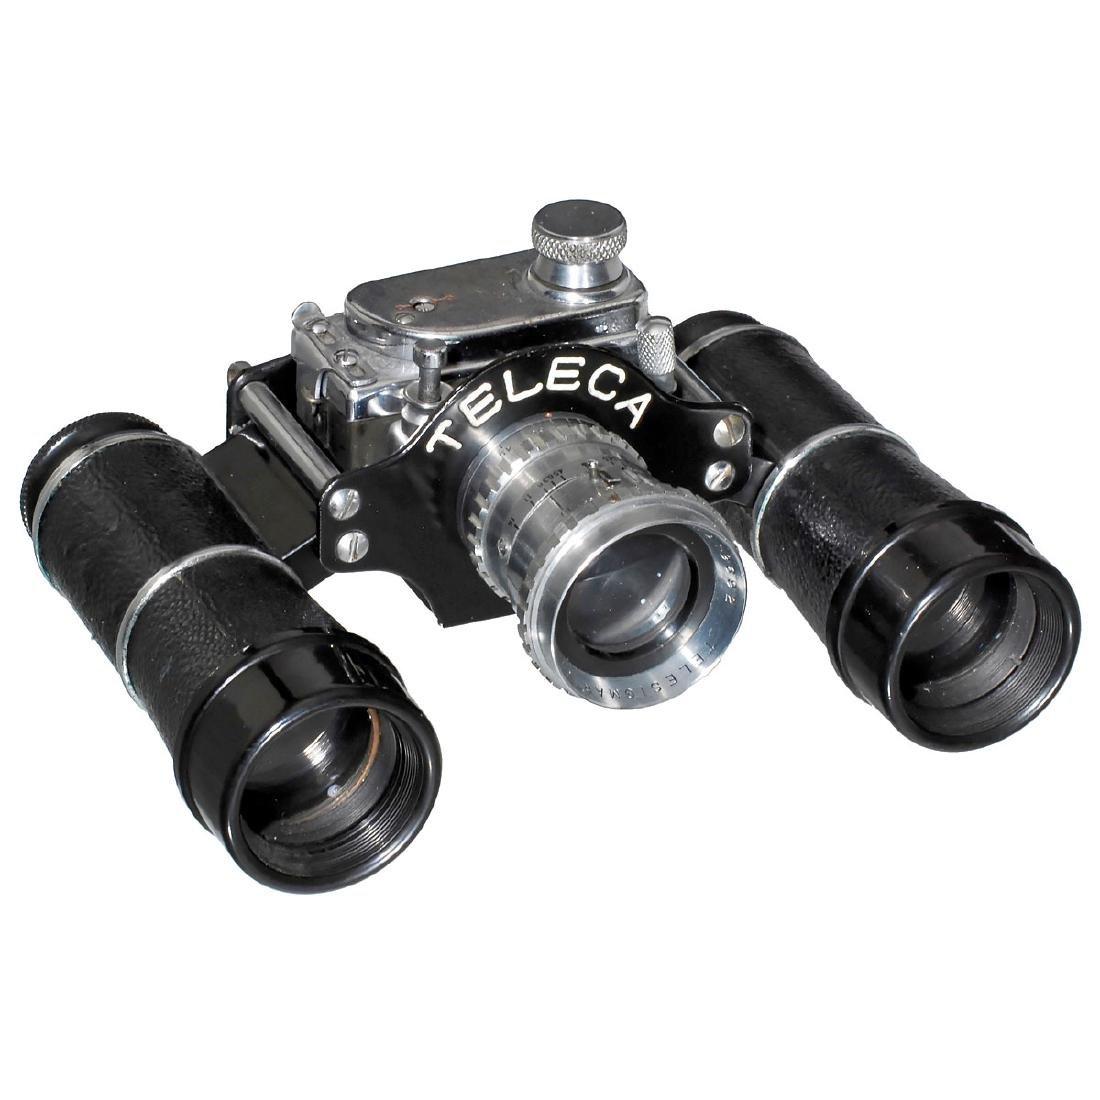 Teleca (Binocular Camera), c. 1950